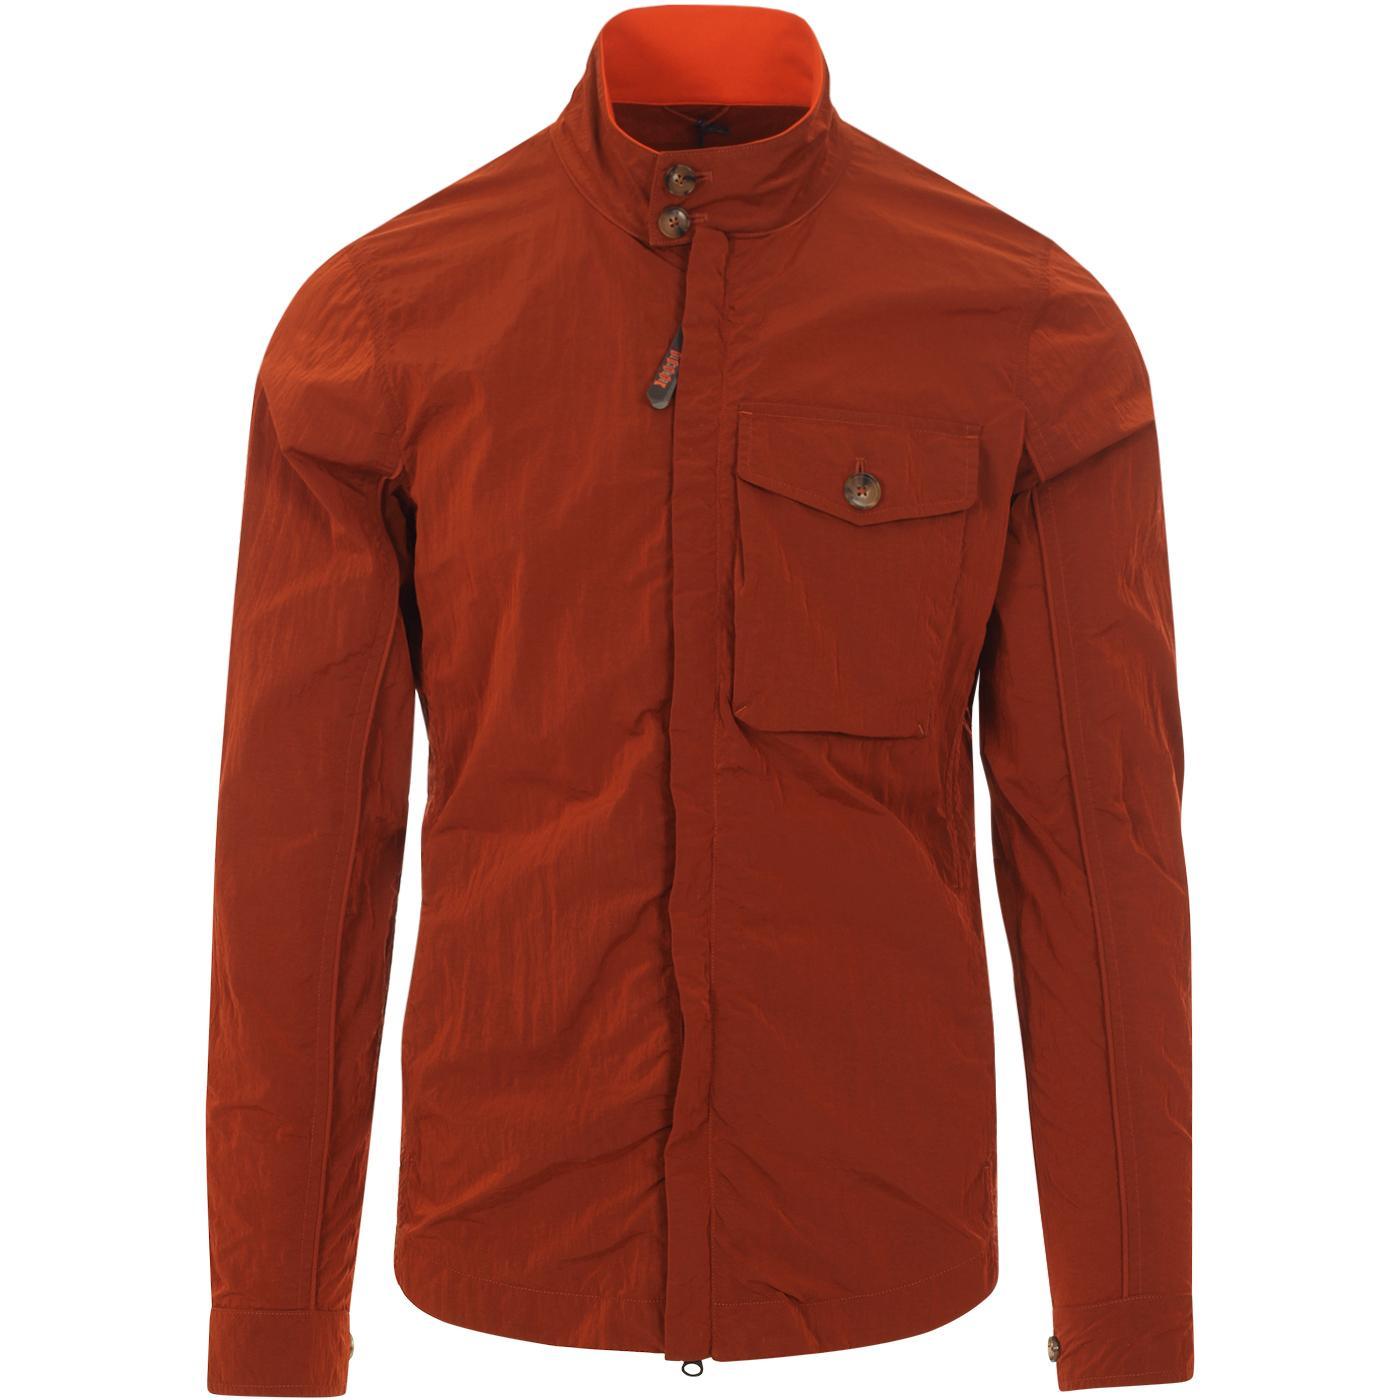 BARACUTA Nylon Garment Dye Harrington Overshirt P